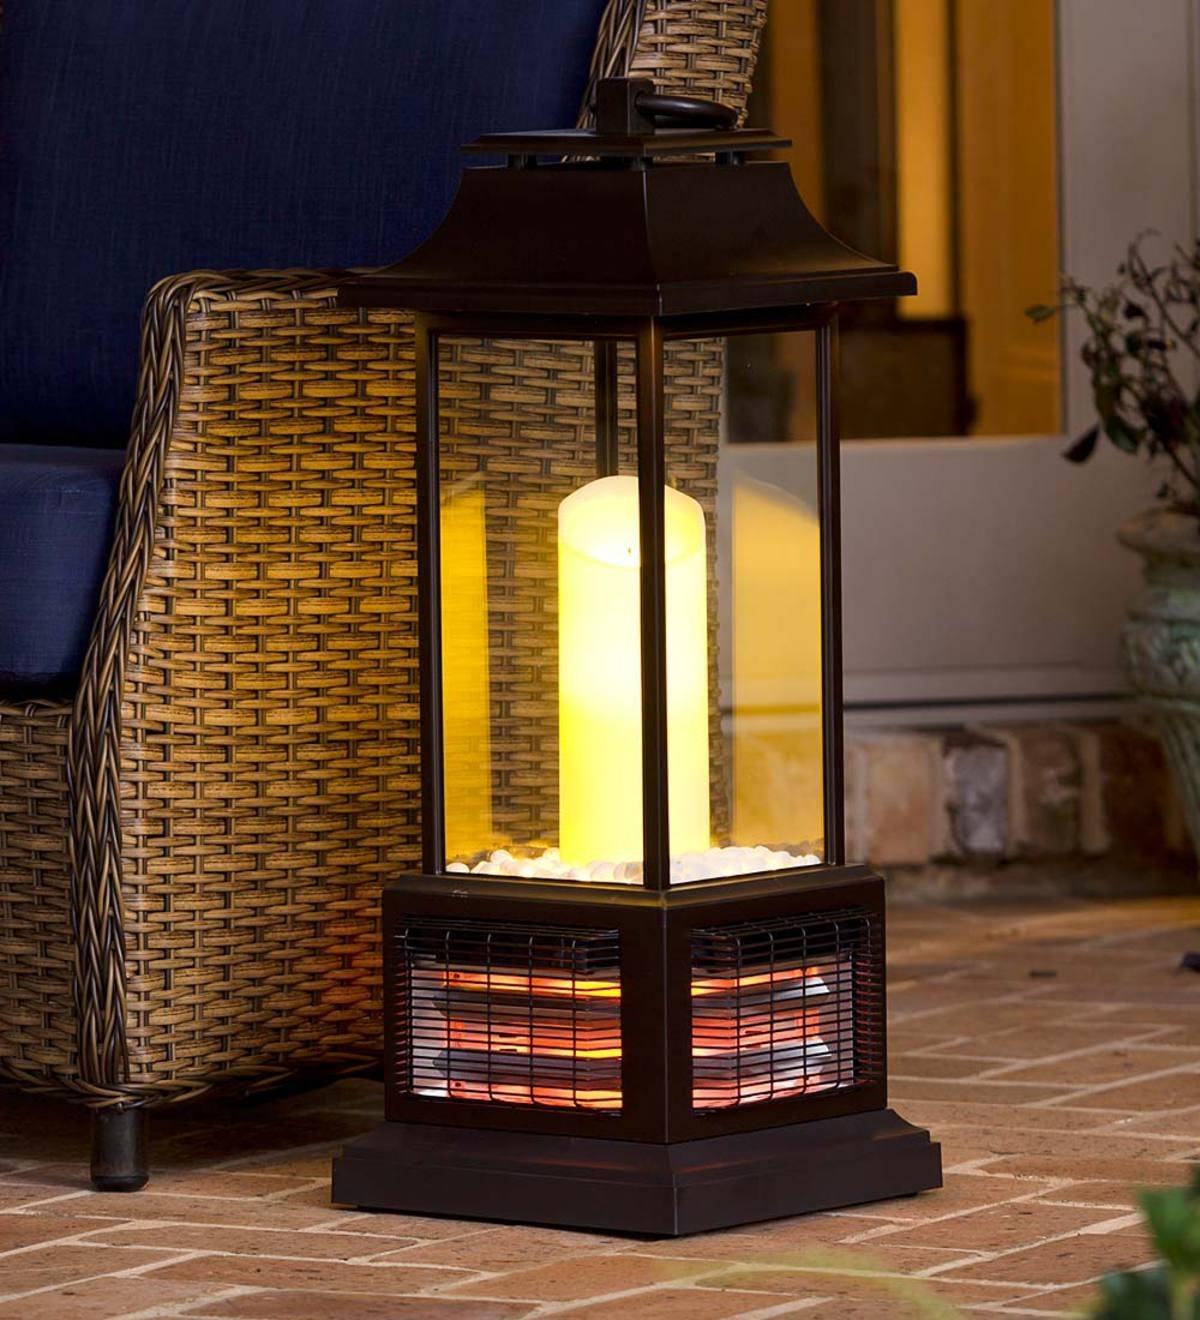 Outdoor Infrared Lantern Heater | Outdoor Lamps & Lighting | Deck regarding Outdoor Lawn Lanterns (Image 11 of 20)